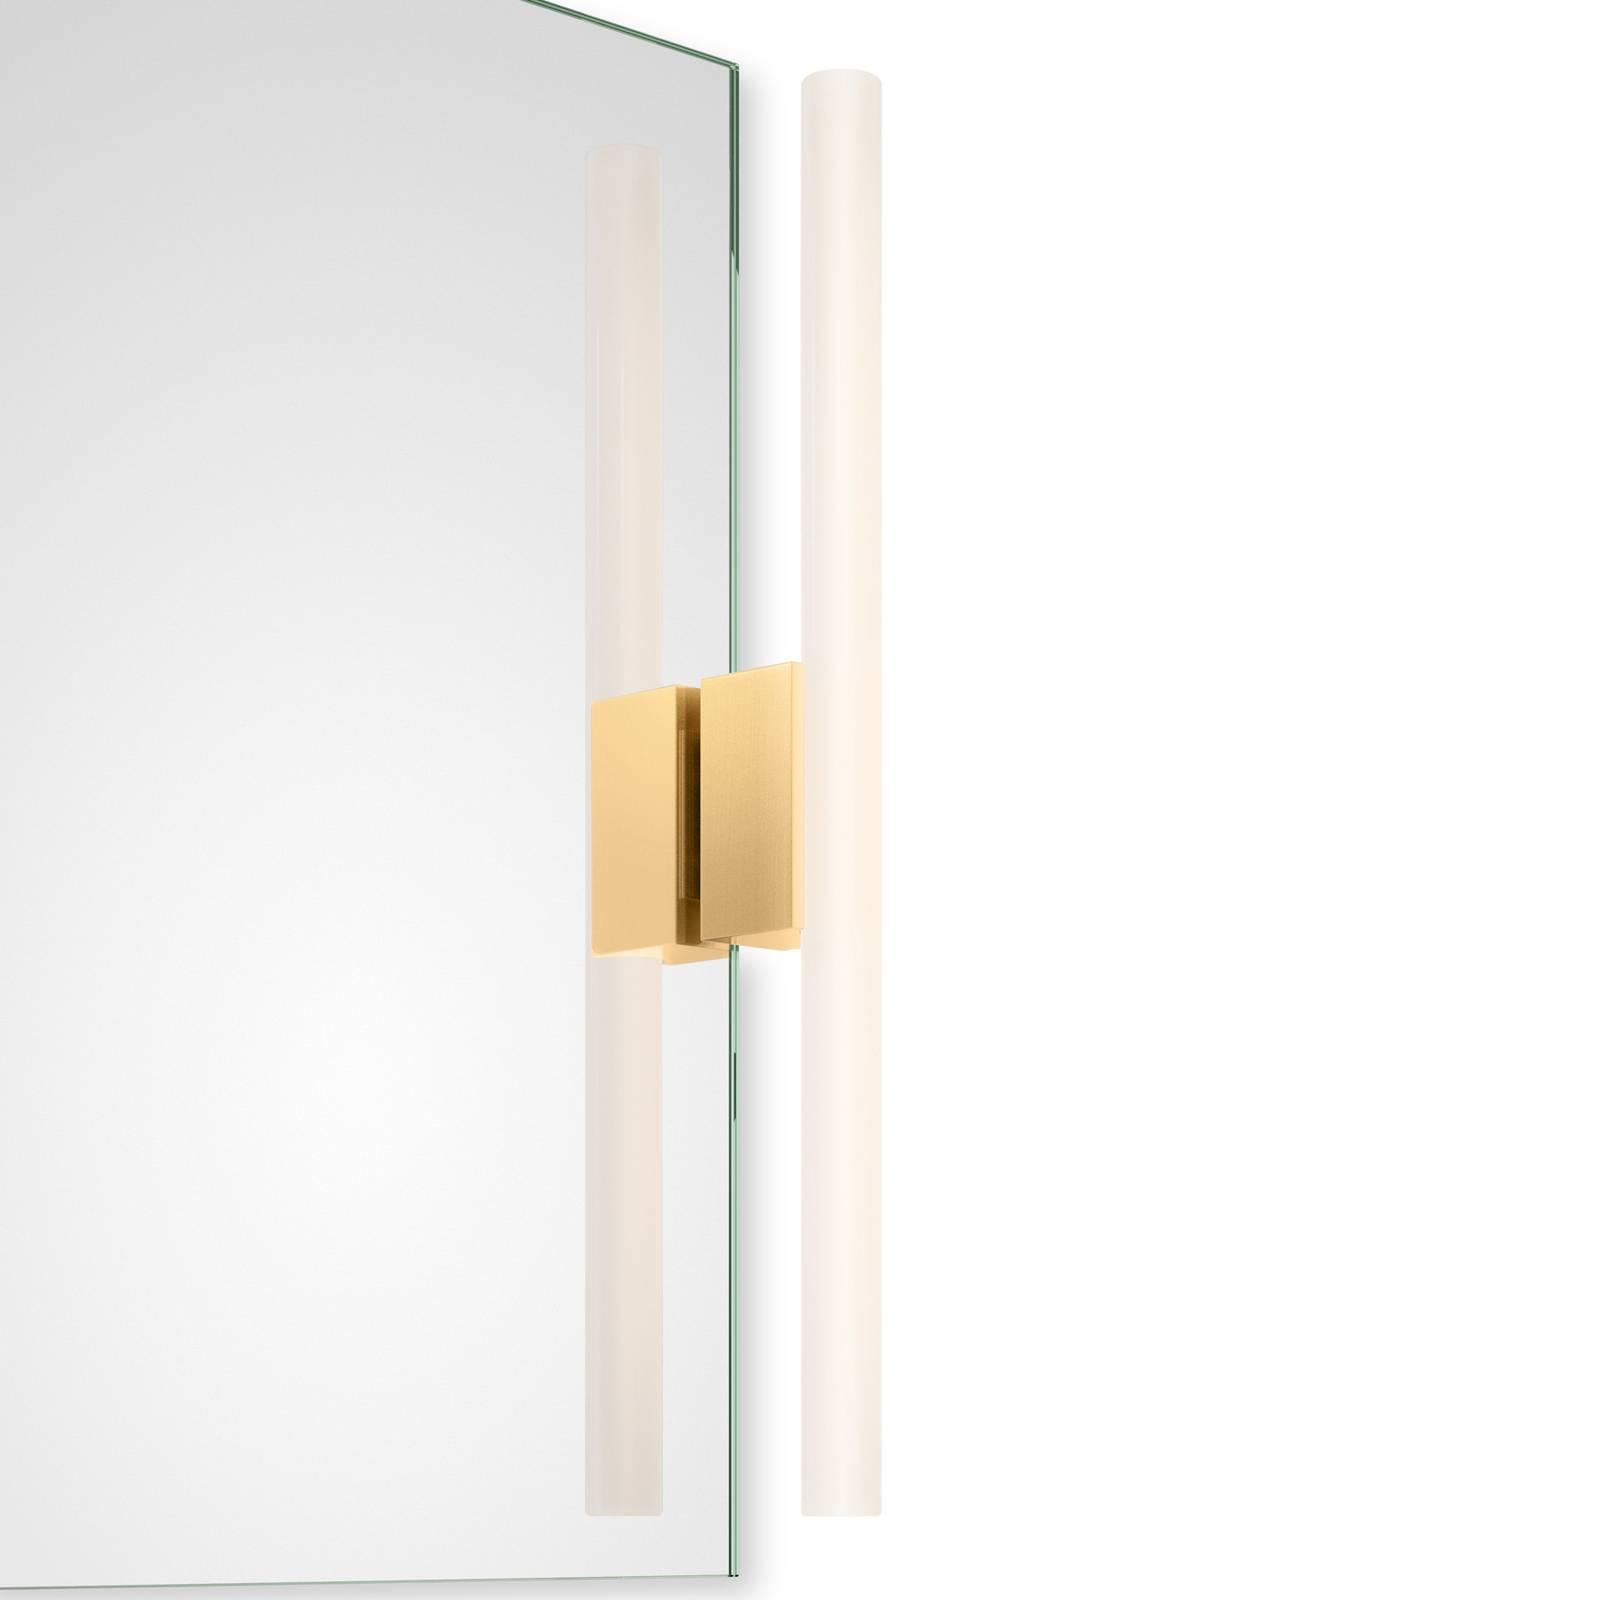 Decor Walther Omega 1 applique pour miroir or mat